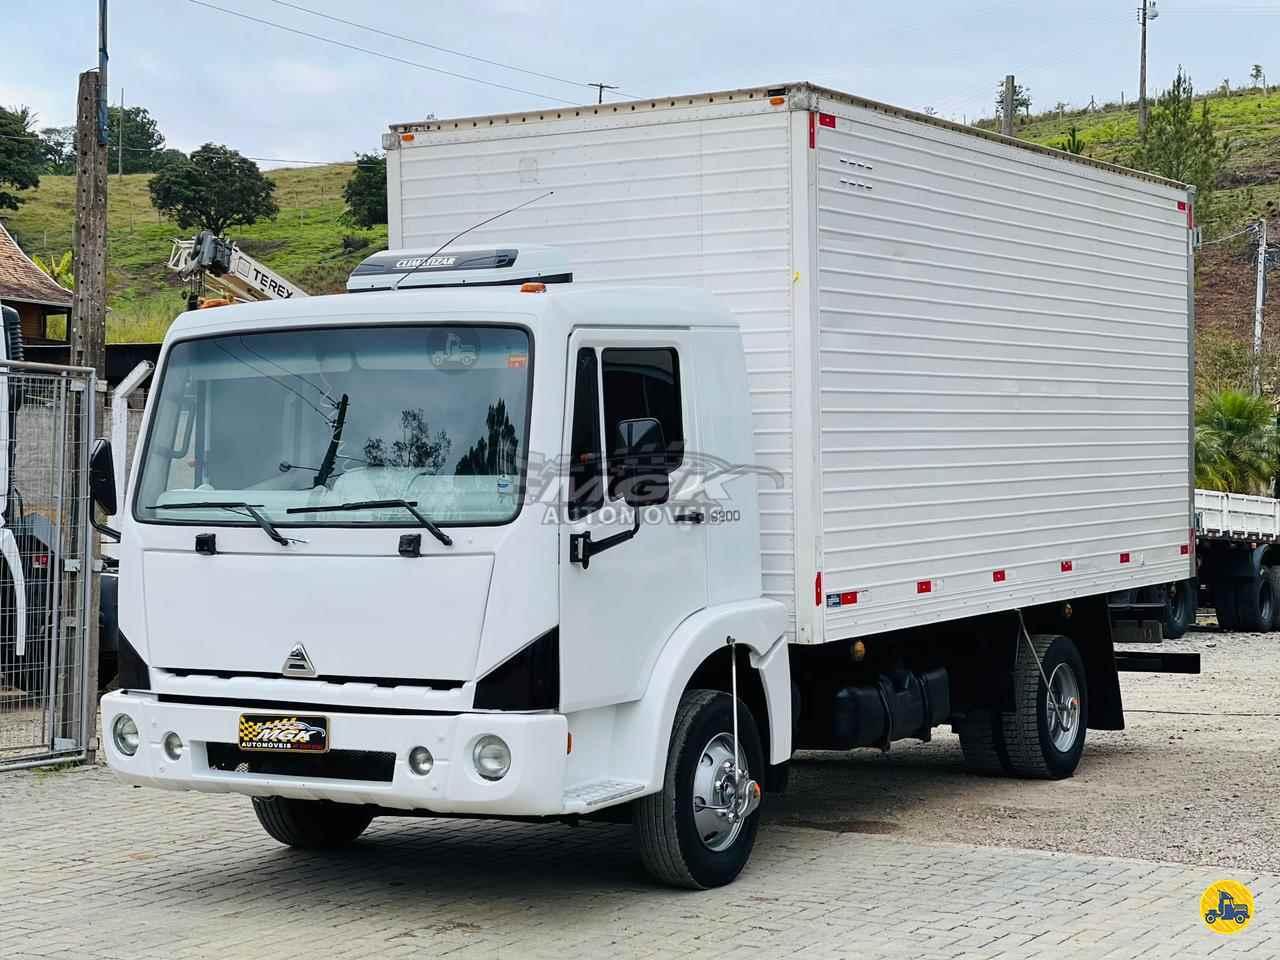 AGRALE 9200 de MGK Automóveis - IBIRAMA/SC